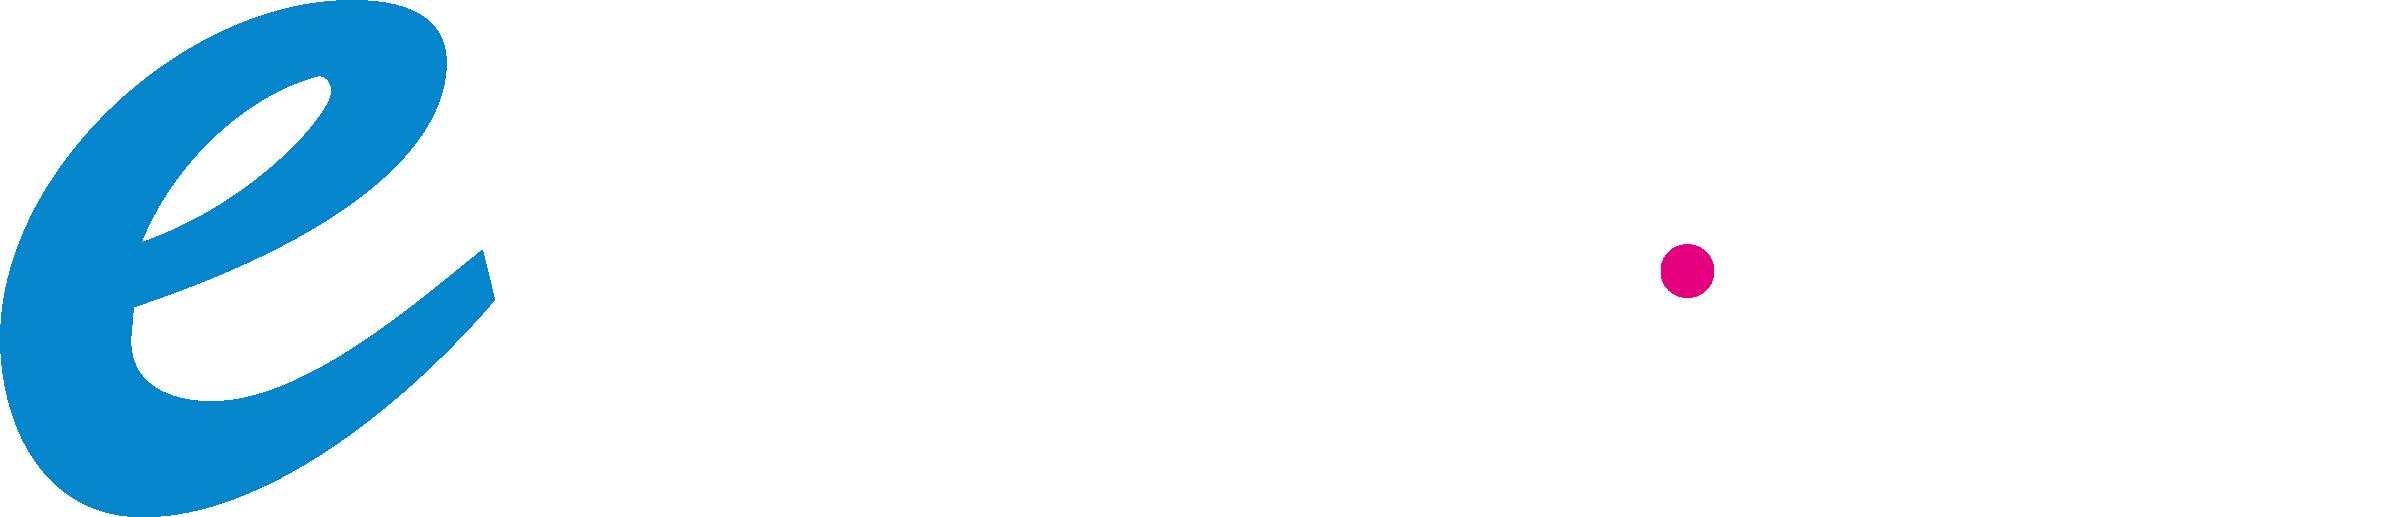 eスポーツ専用施設「eスタジアム」